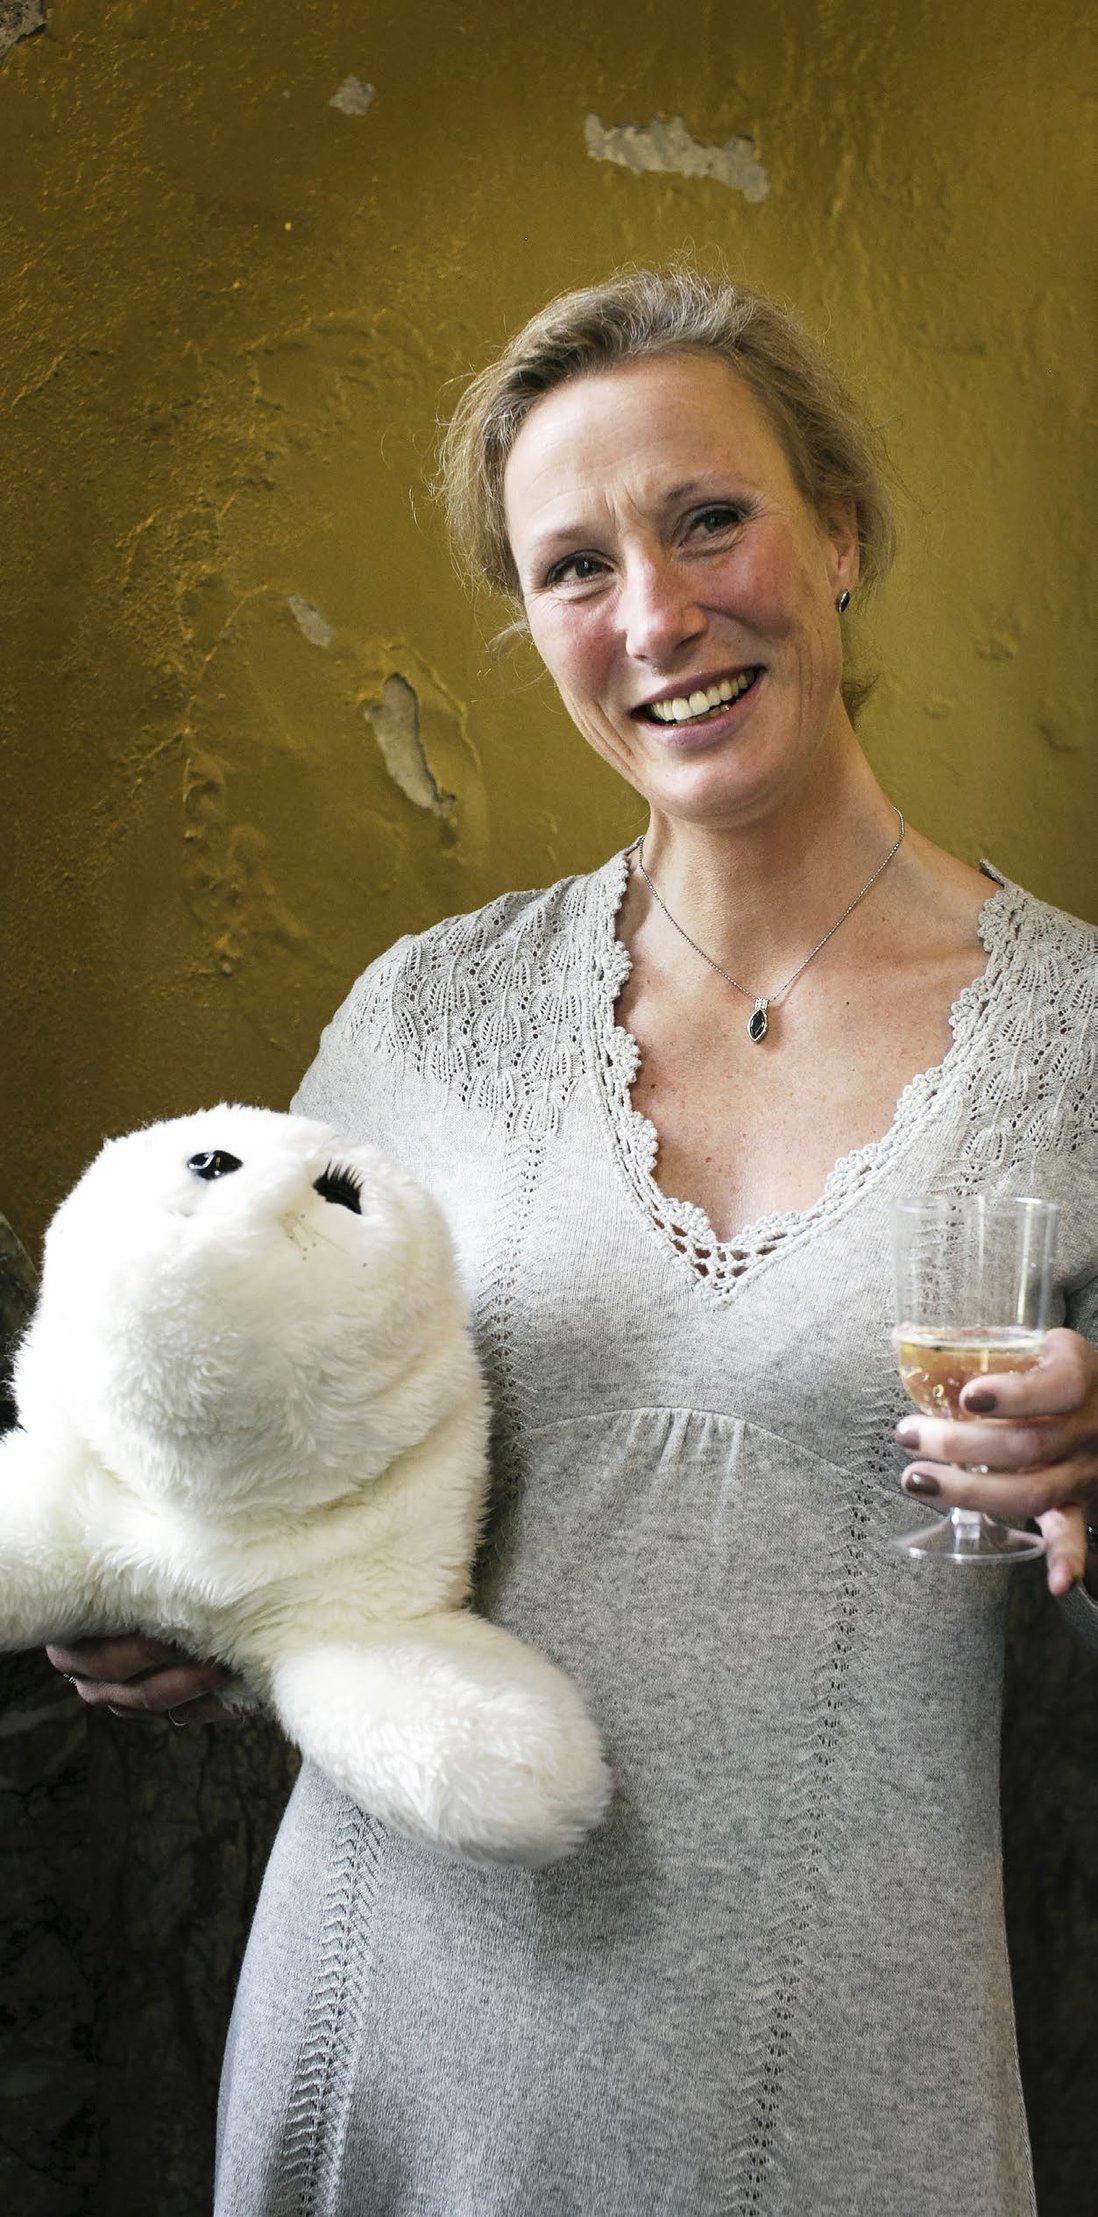 Nina Jøranson